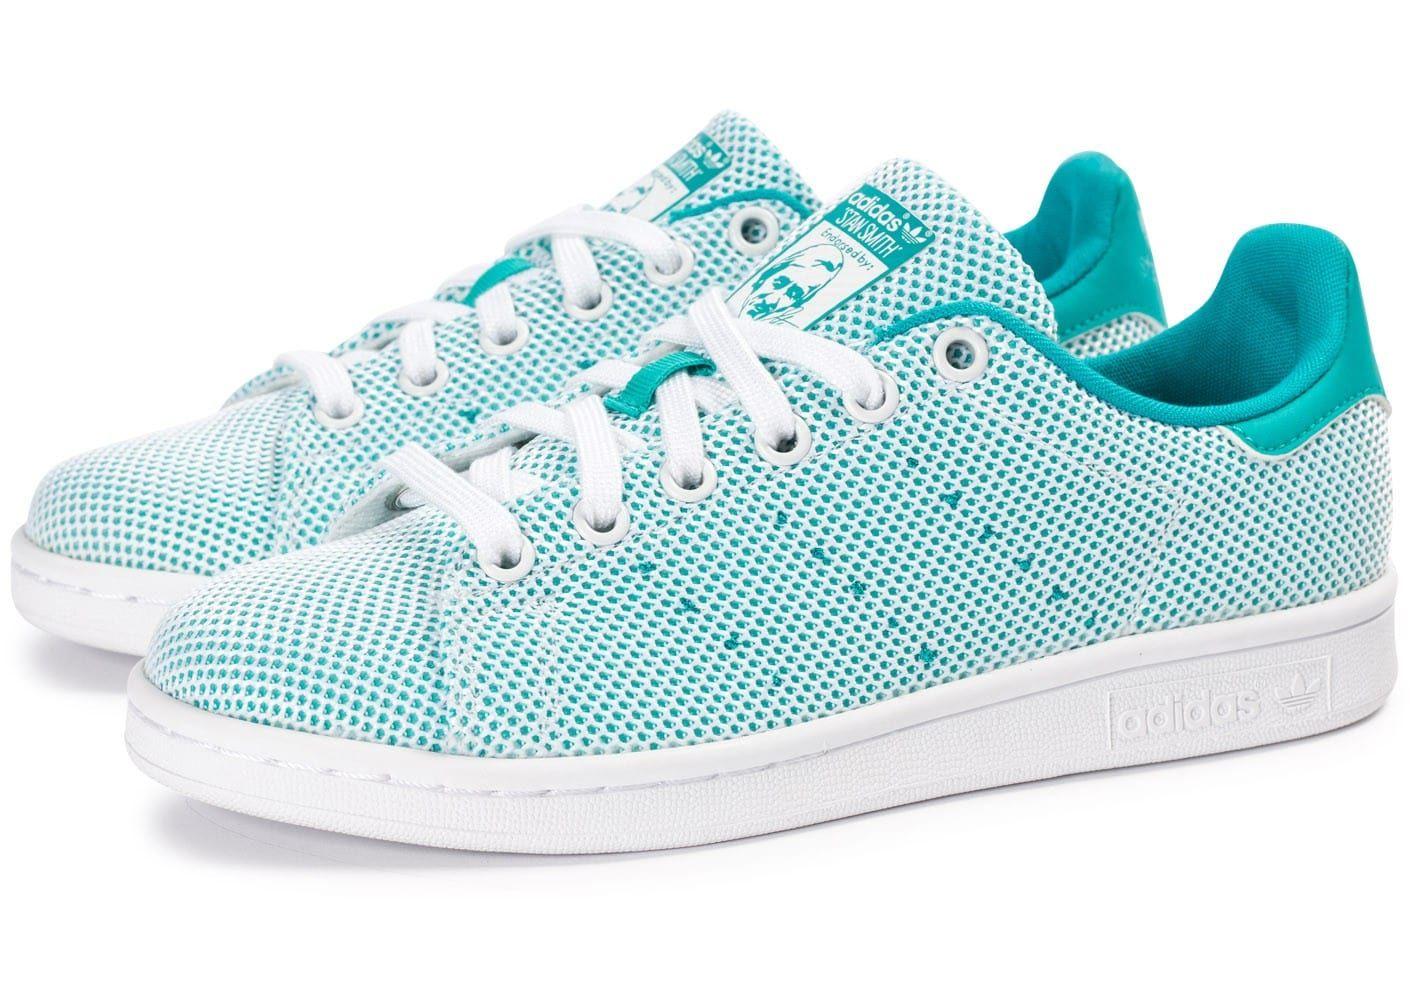 adidas stan smith femme turquoise